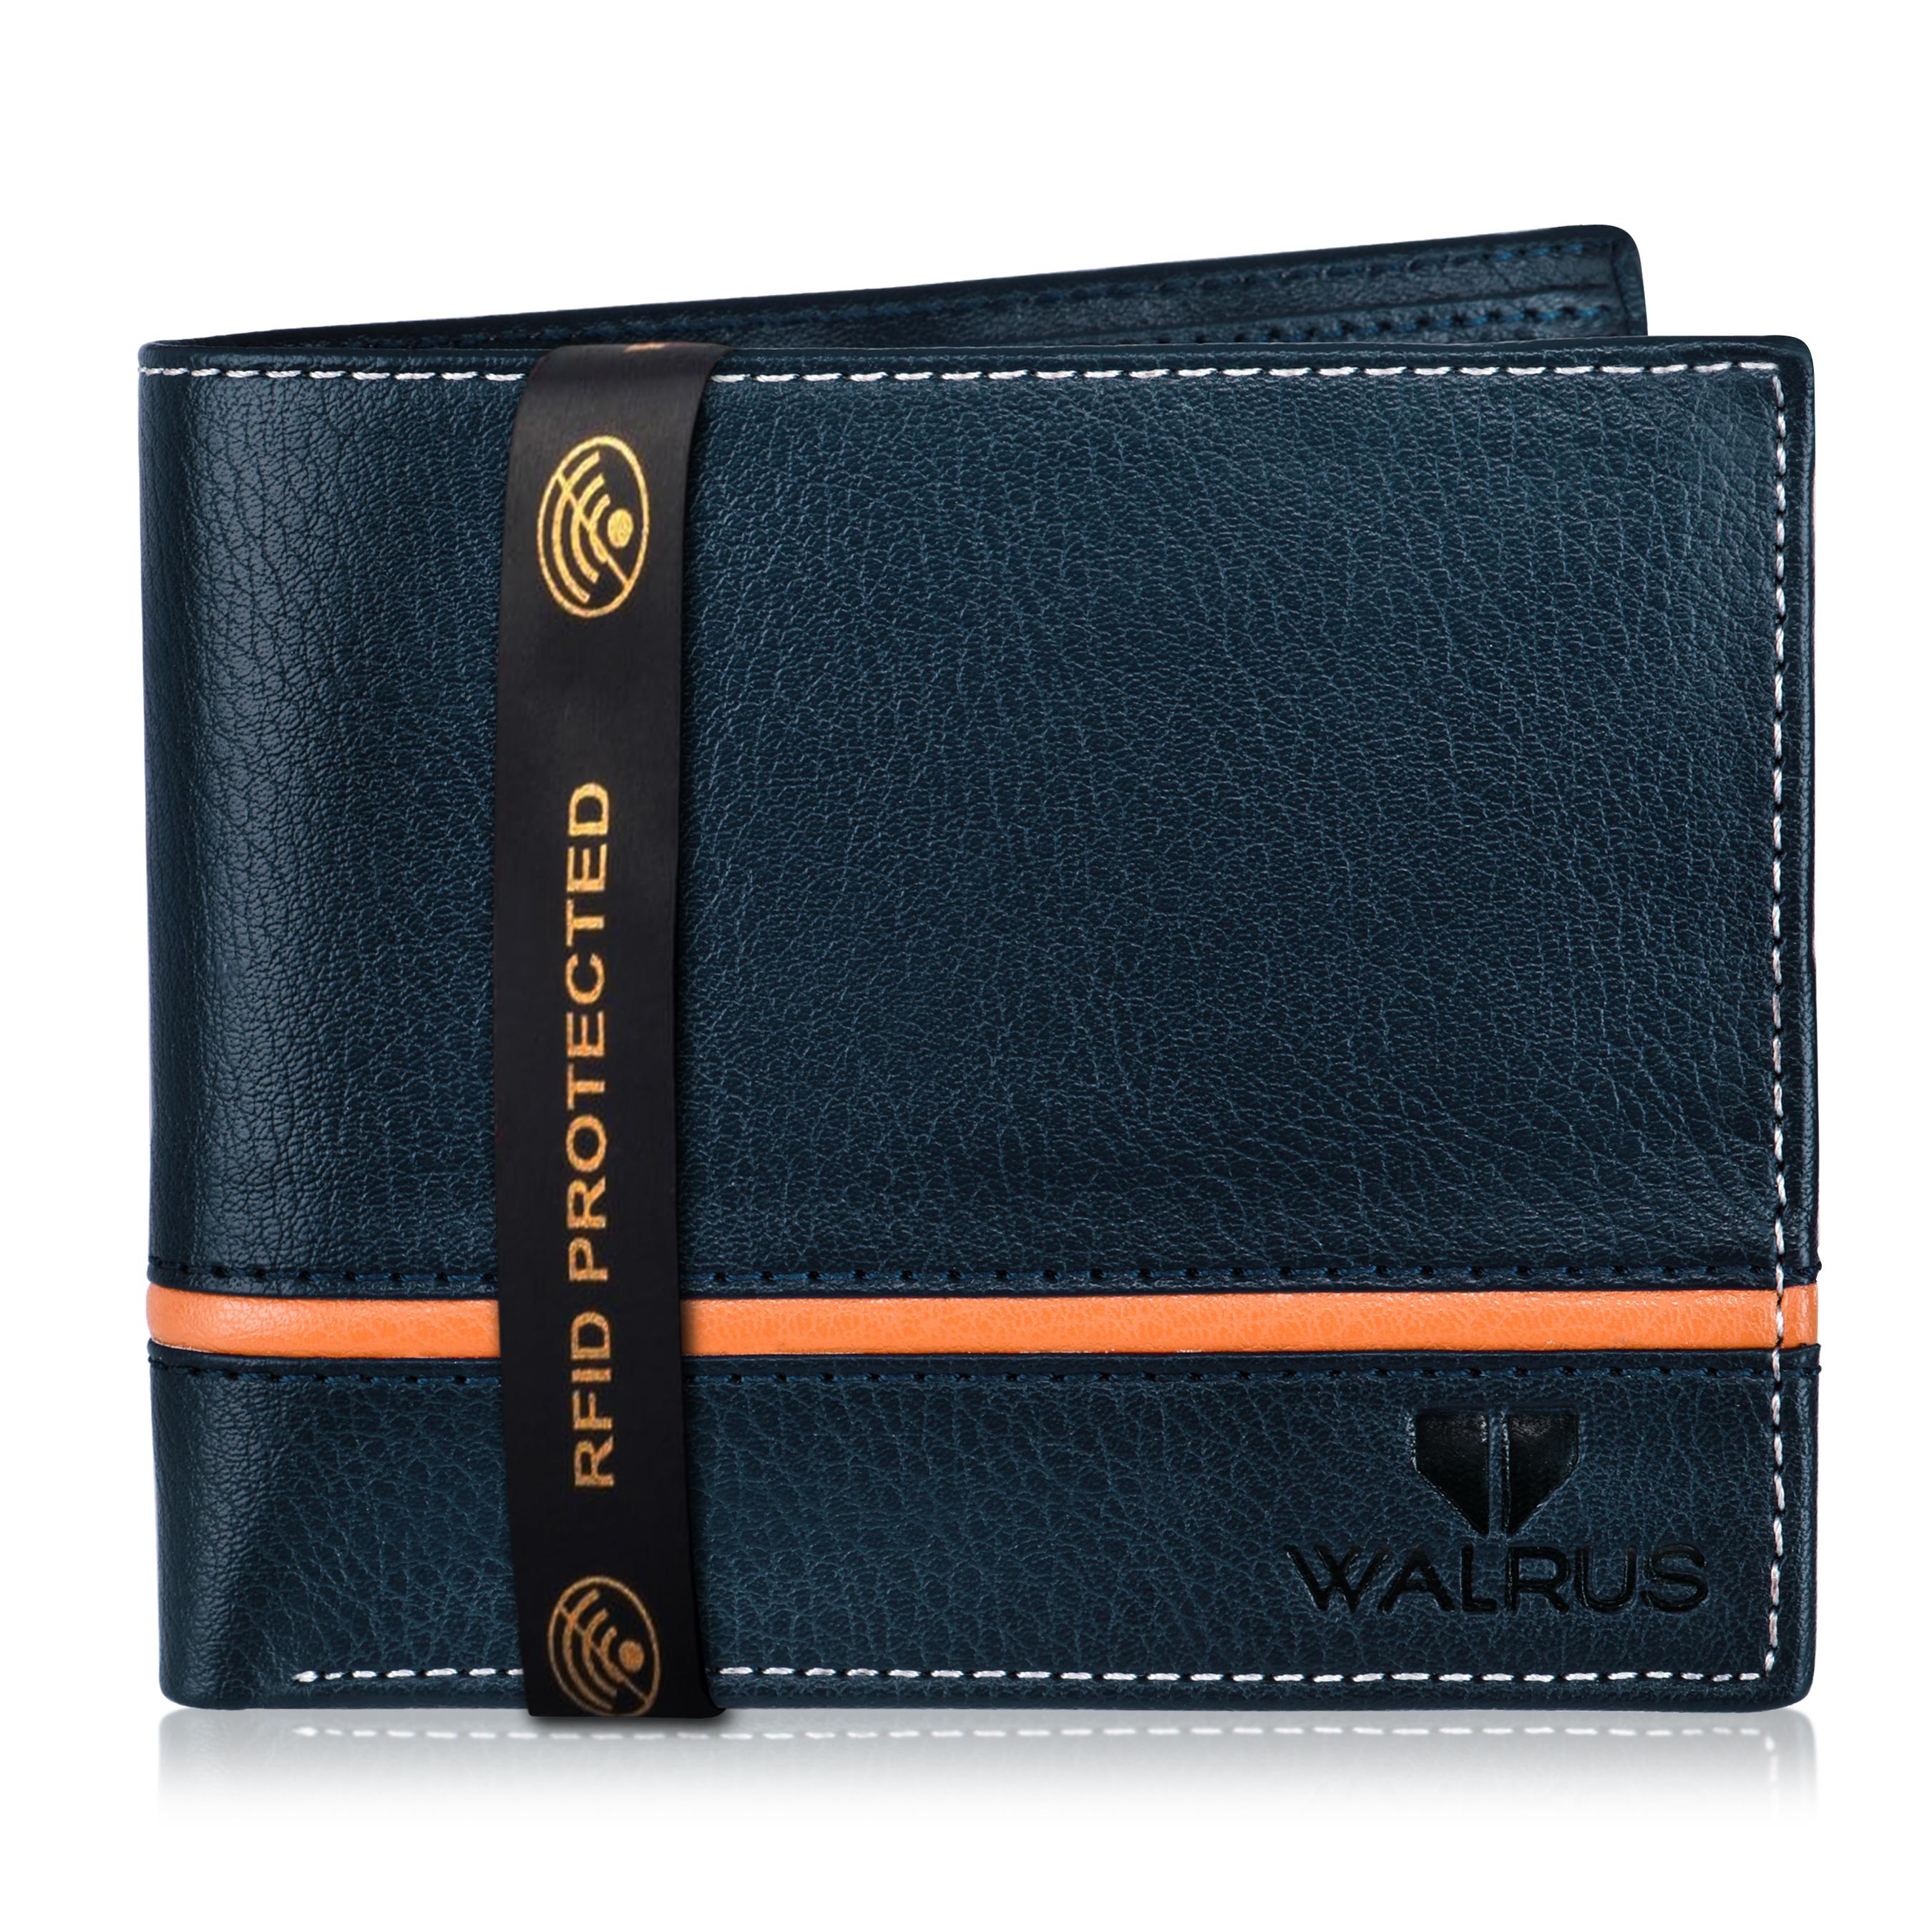 Walrus | Walrus Duke-III Blue Leather Men Wallet With RFID Protection.